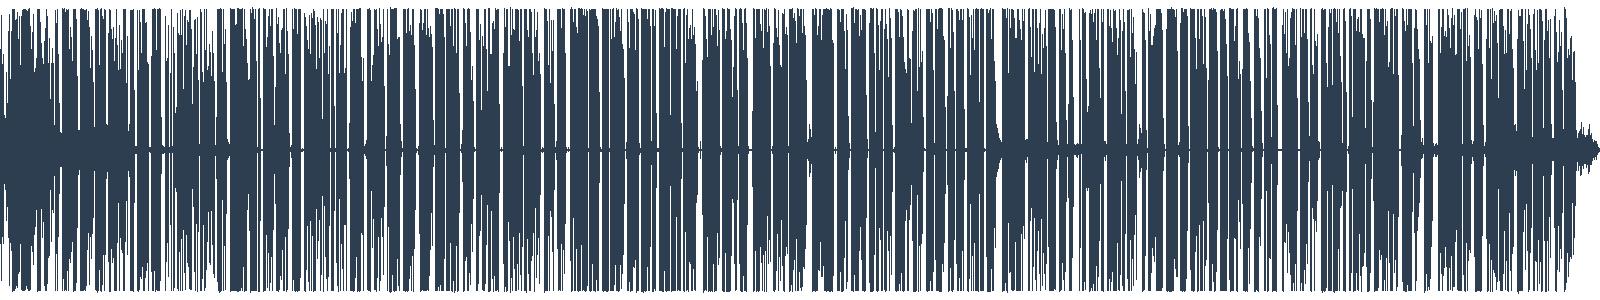 #15 Obraz prvej svetovej vojny vo svetovej literatúre (Maturita s Hashtagom) waveform